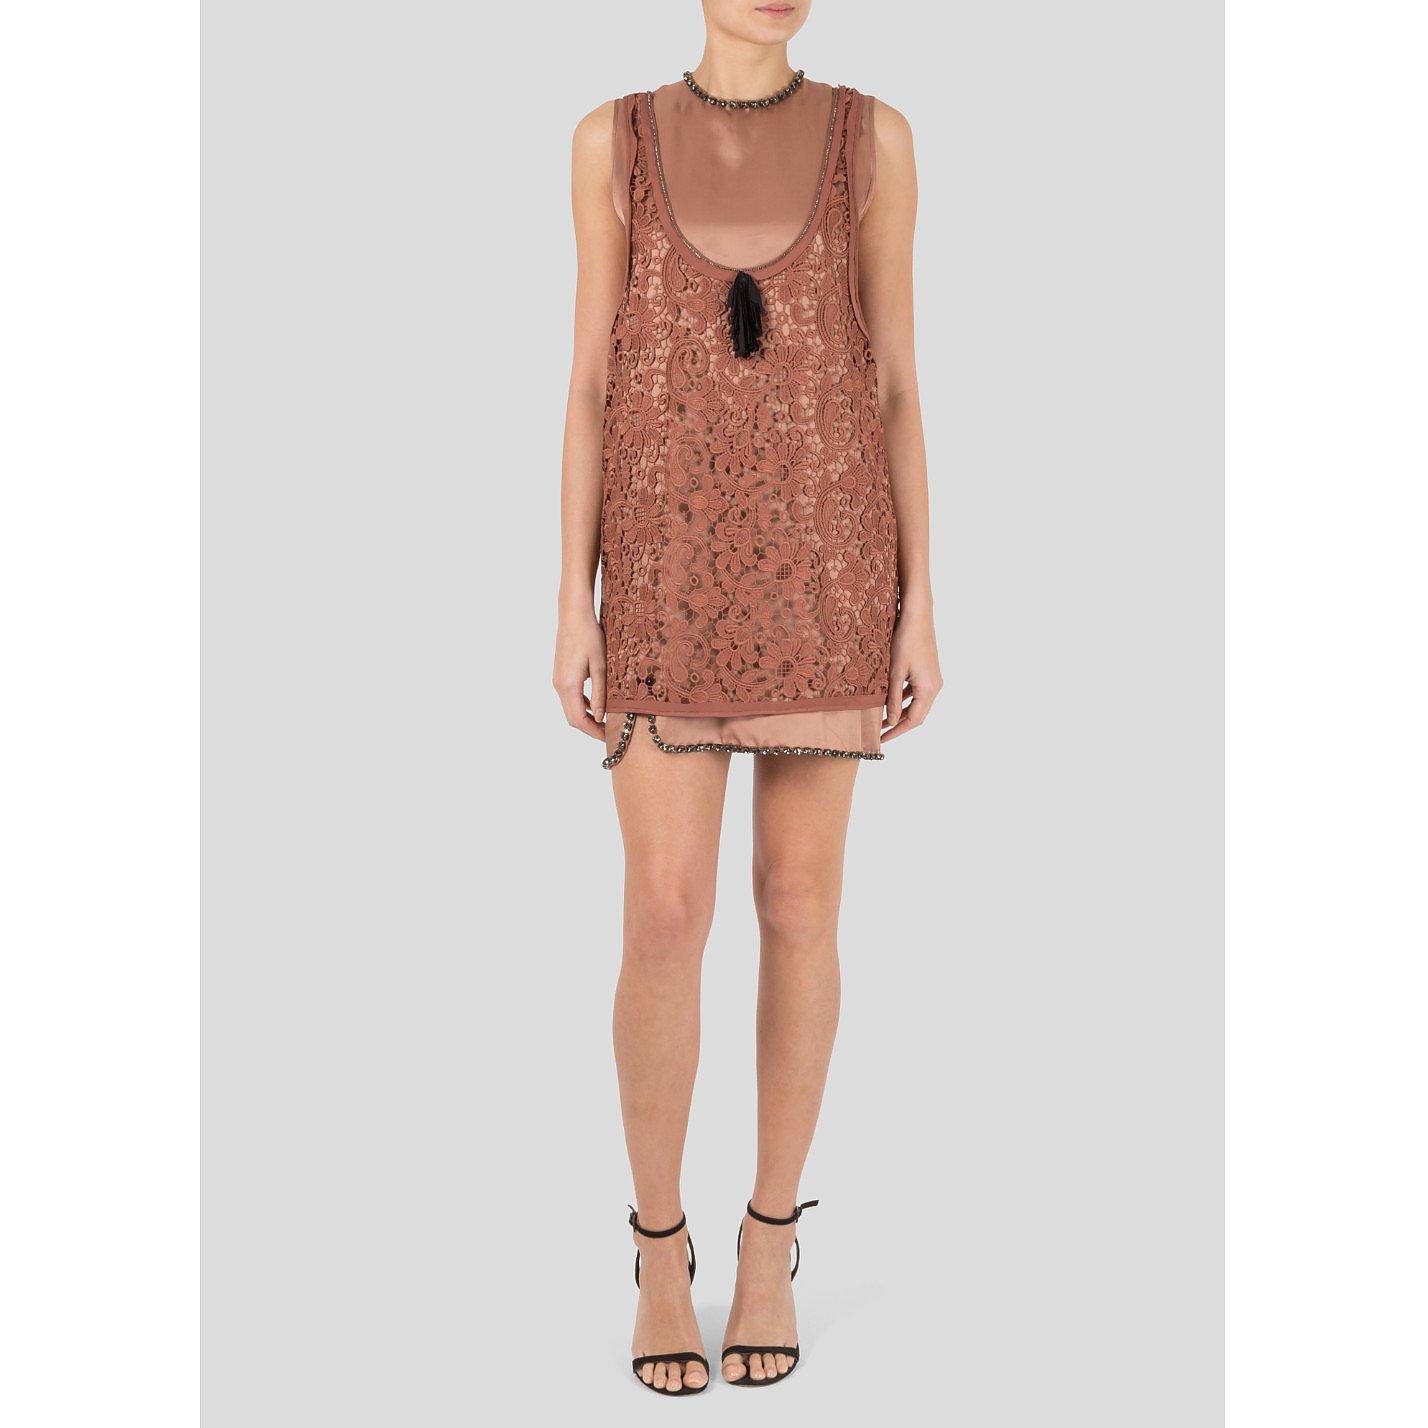 No.21 Lace Crystal Embellished Mini Dress